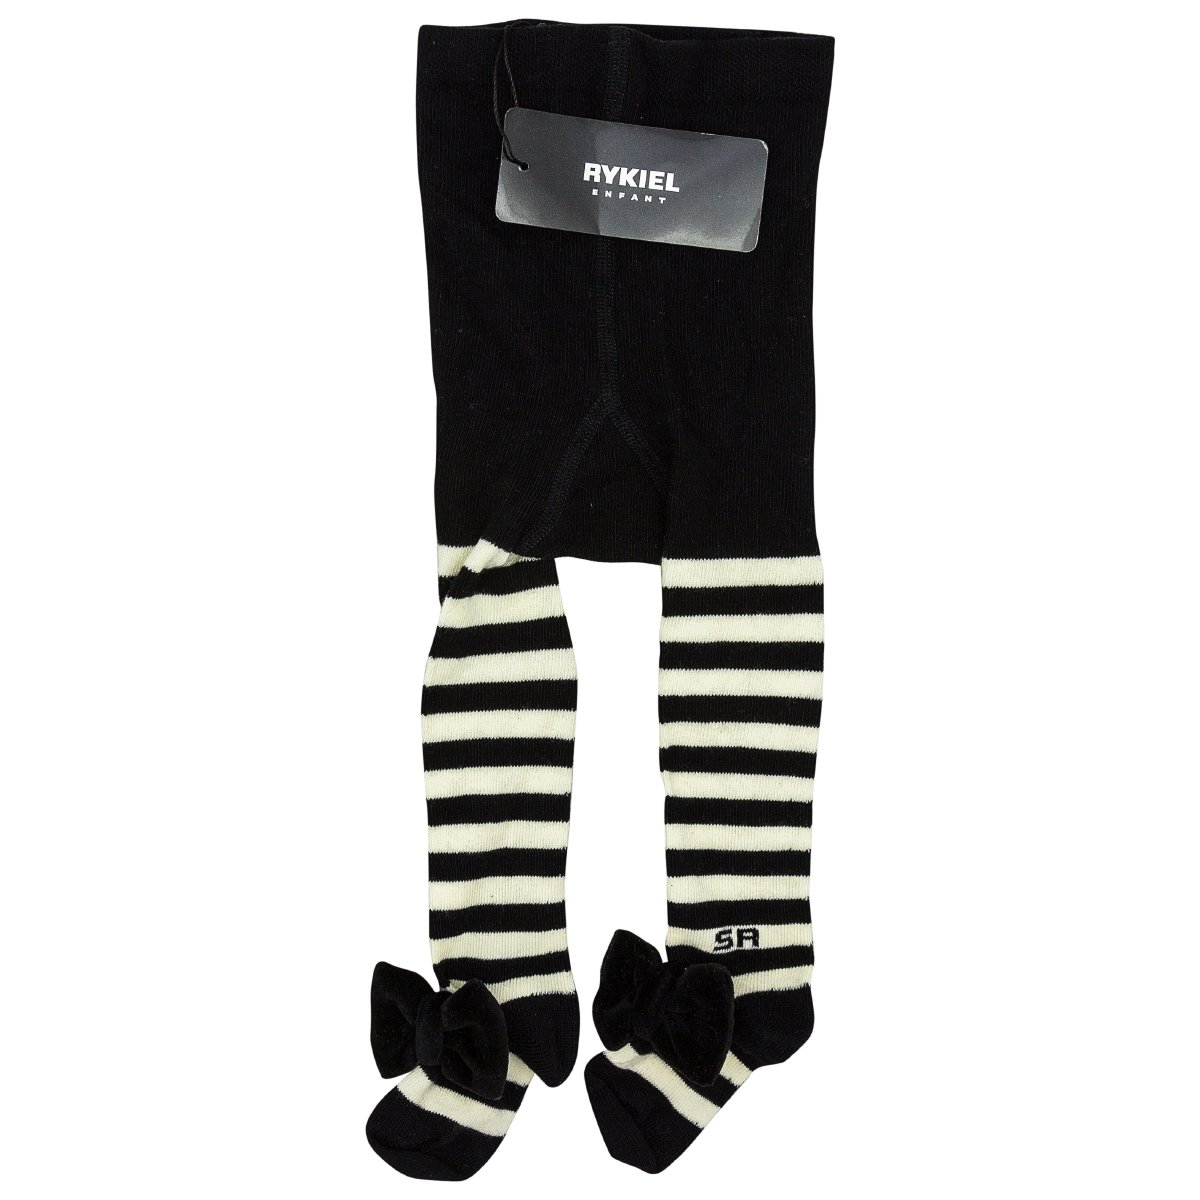 Sonia Rykiel Striped Tights with Velvet Bow